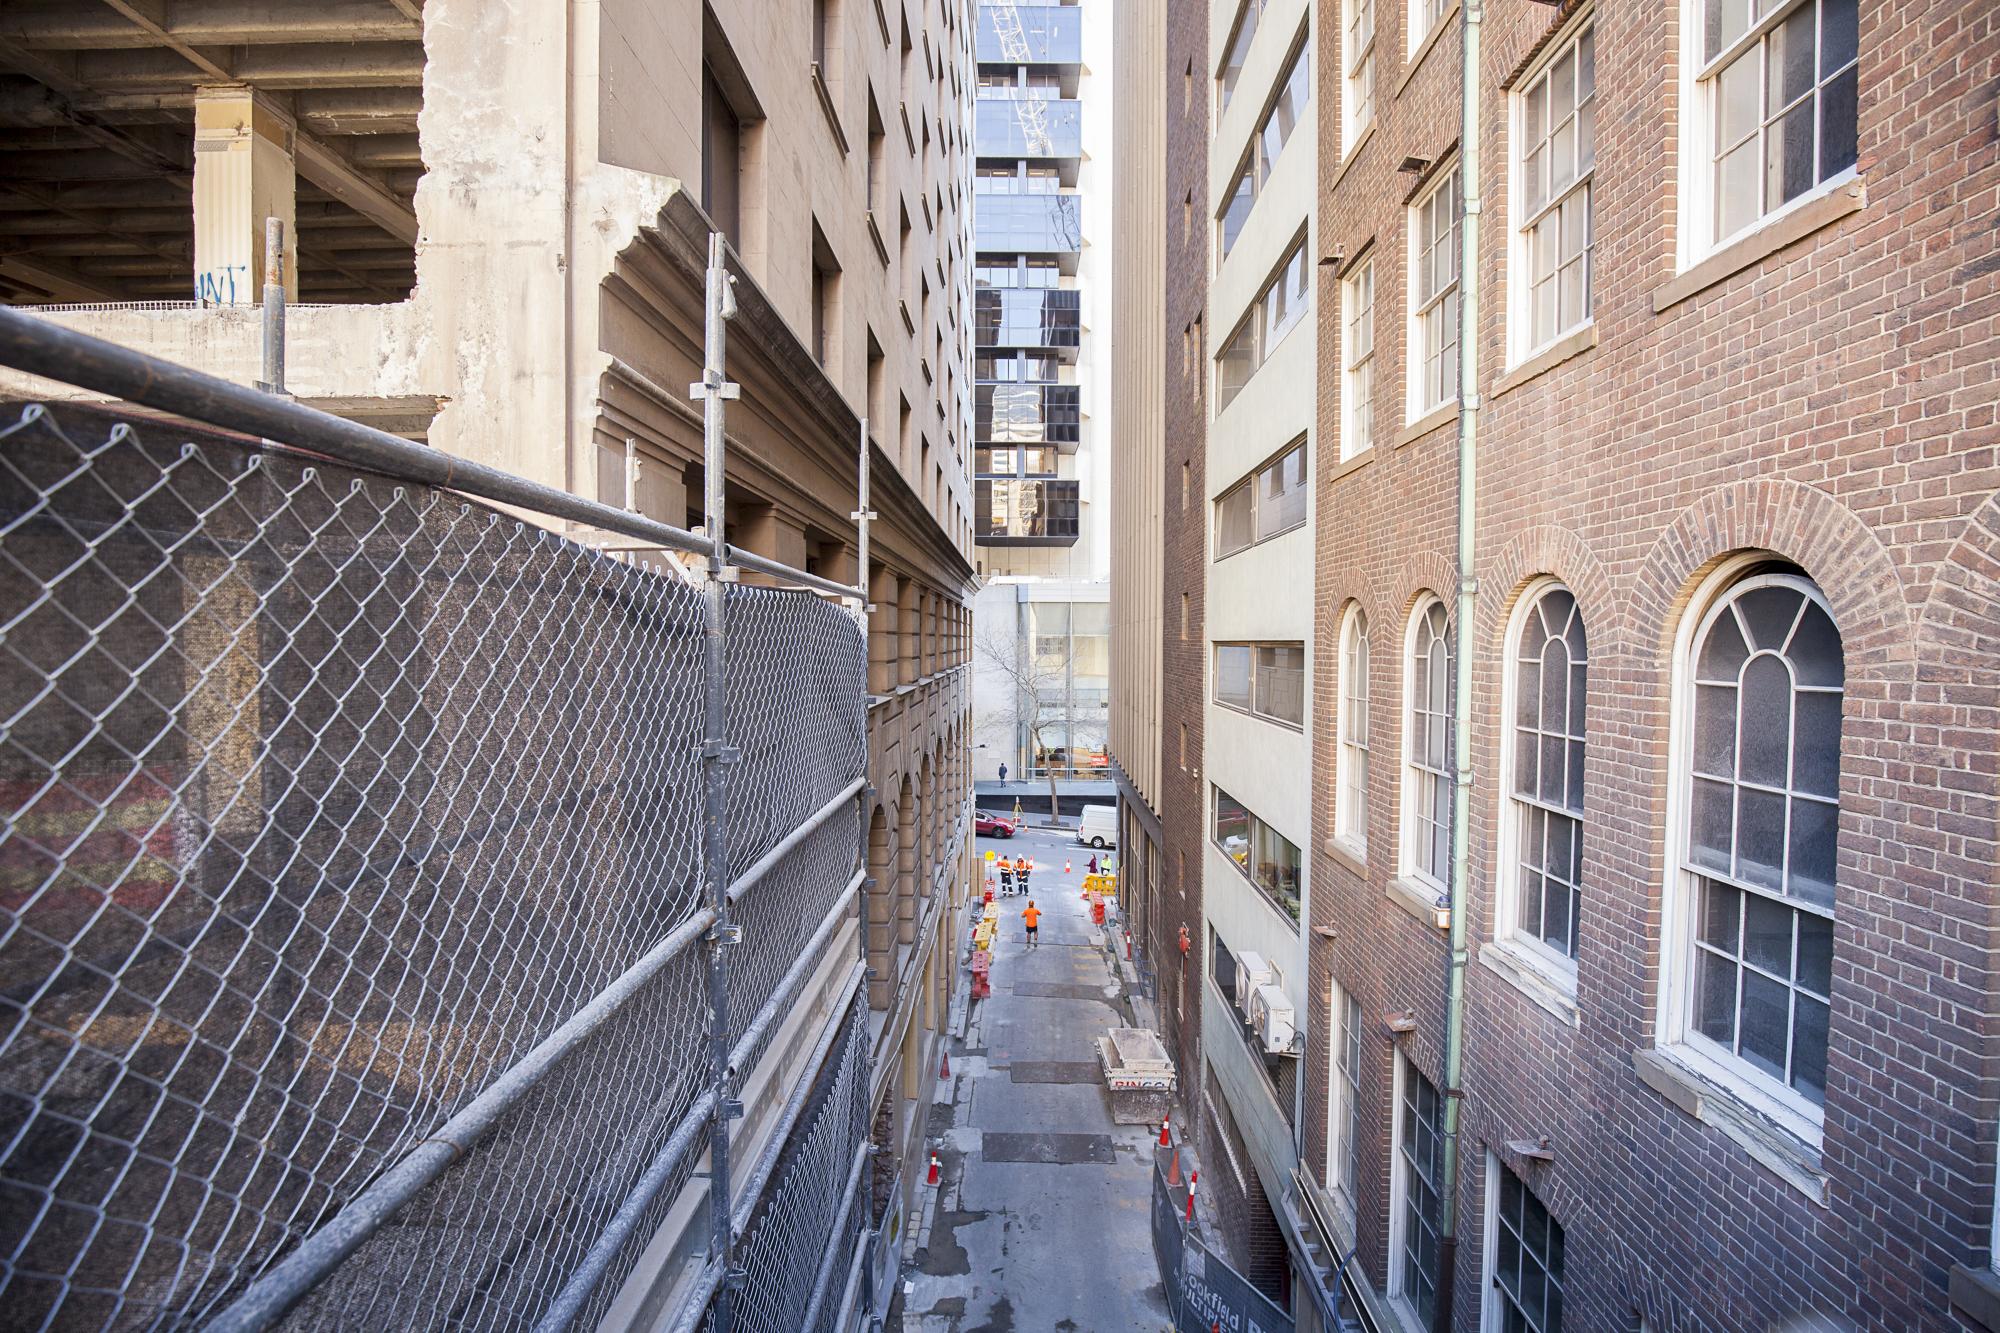 3 Tower - Wynyard lane completion of inground footings a